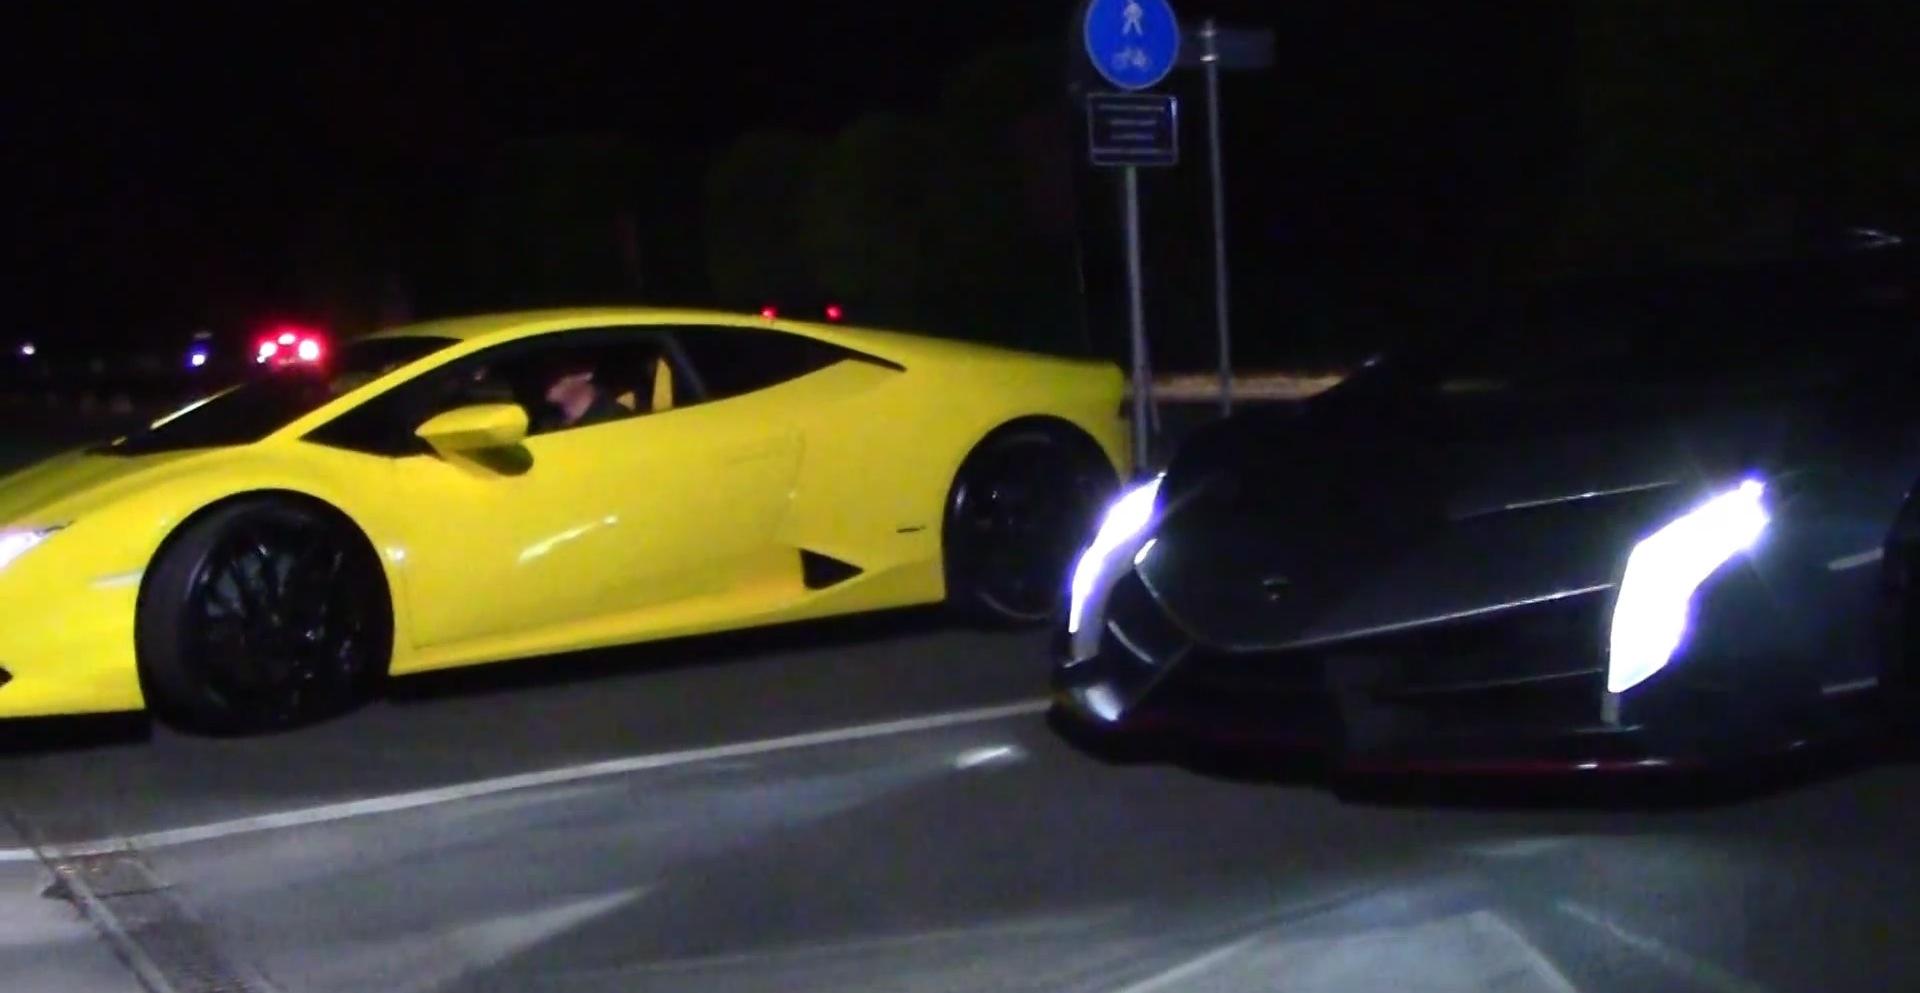 Lamborghini Veneno Roadster Wallpaper Hd Lamborghini Veneno And Huracan Race On Italy S Streets At